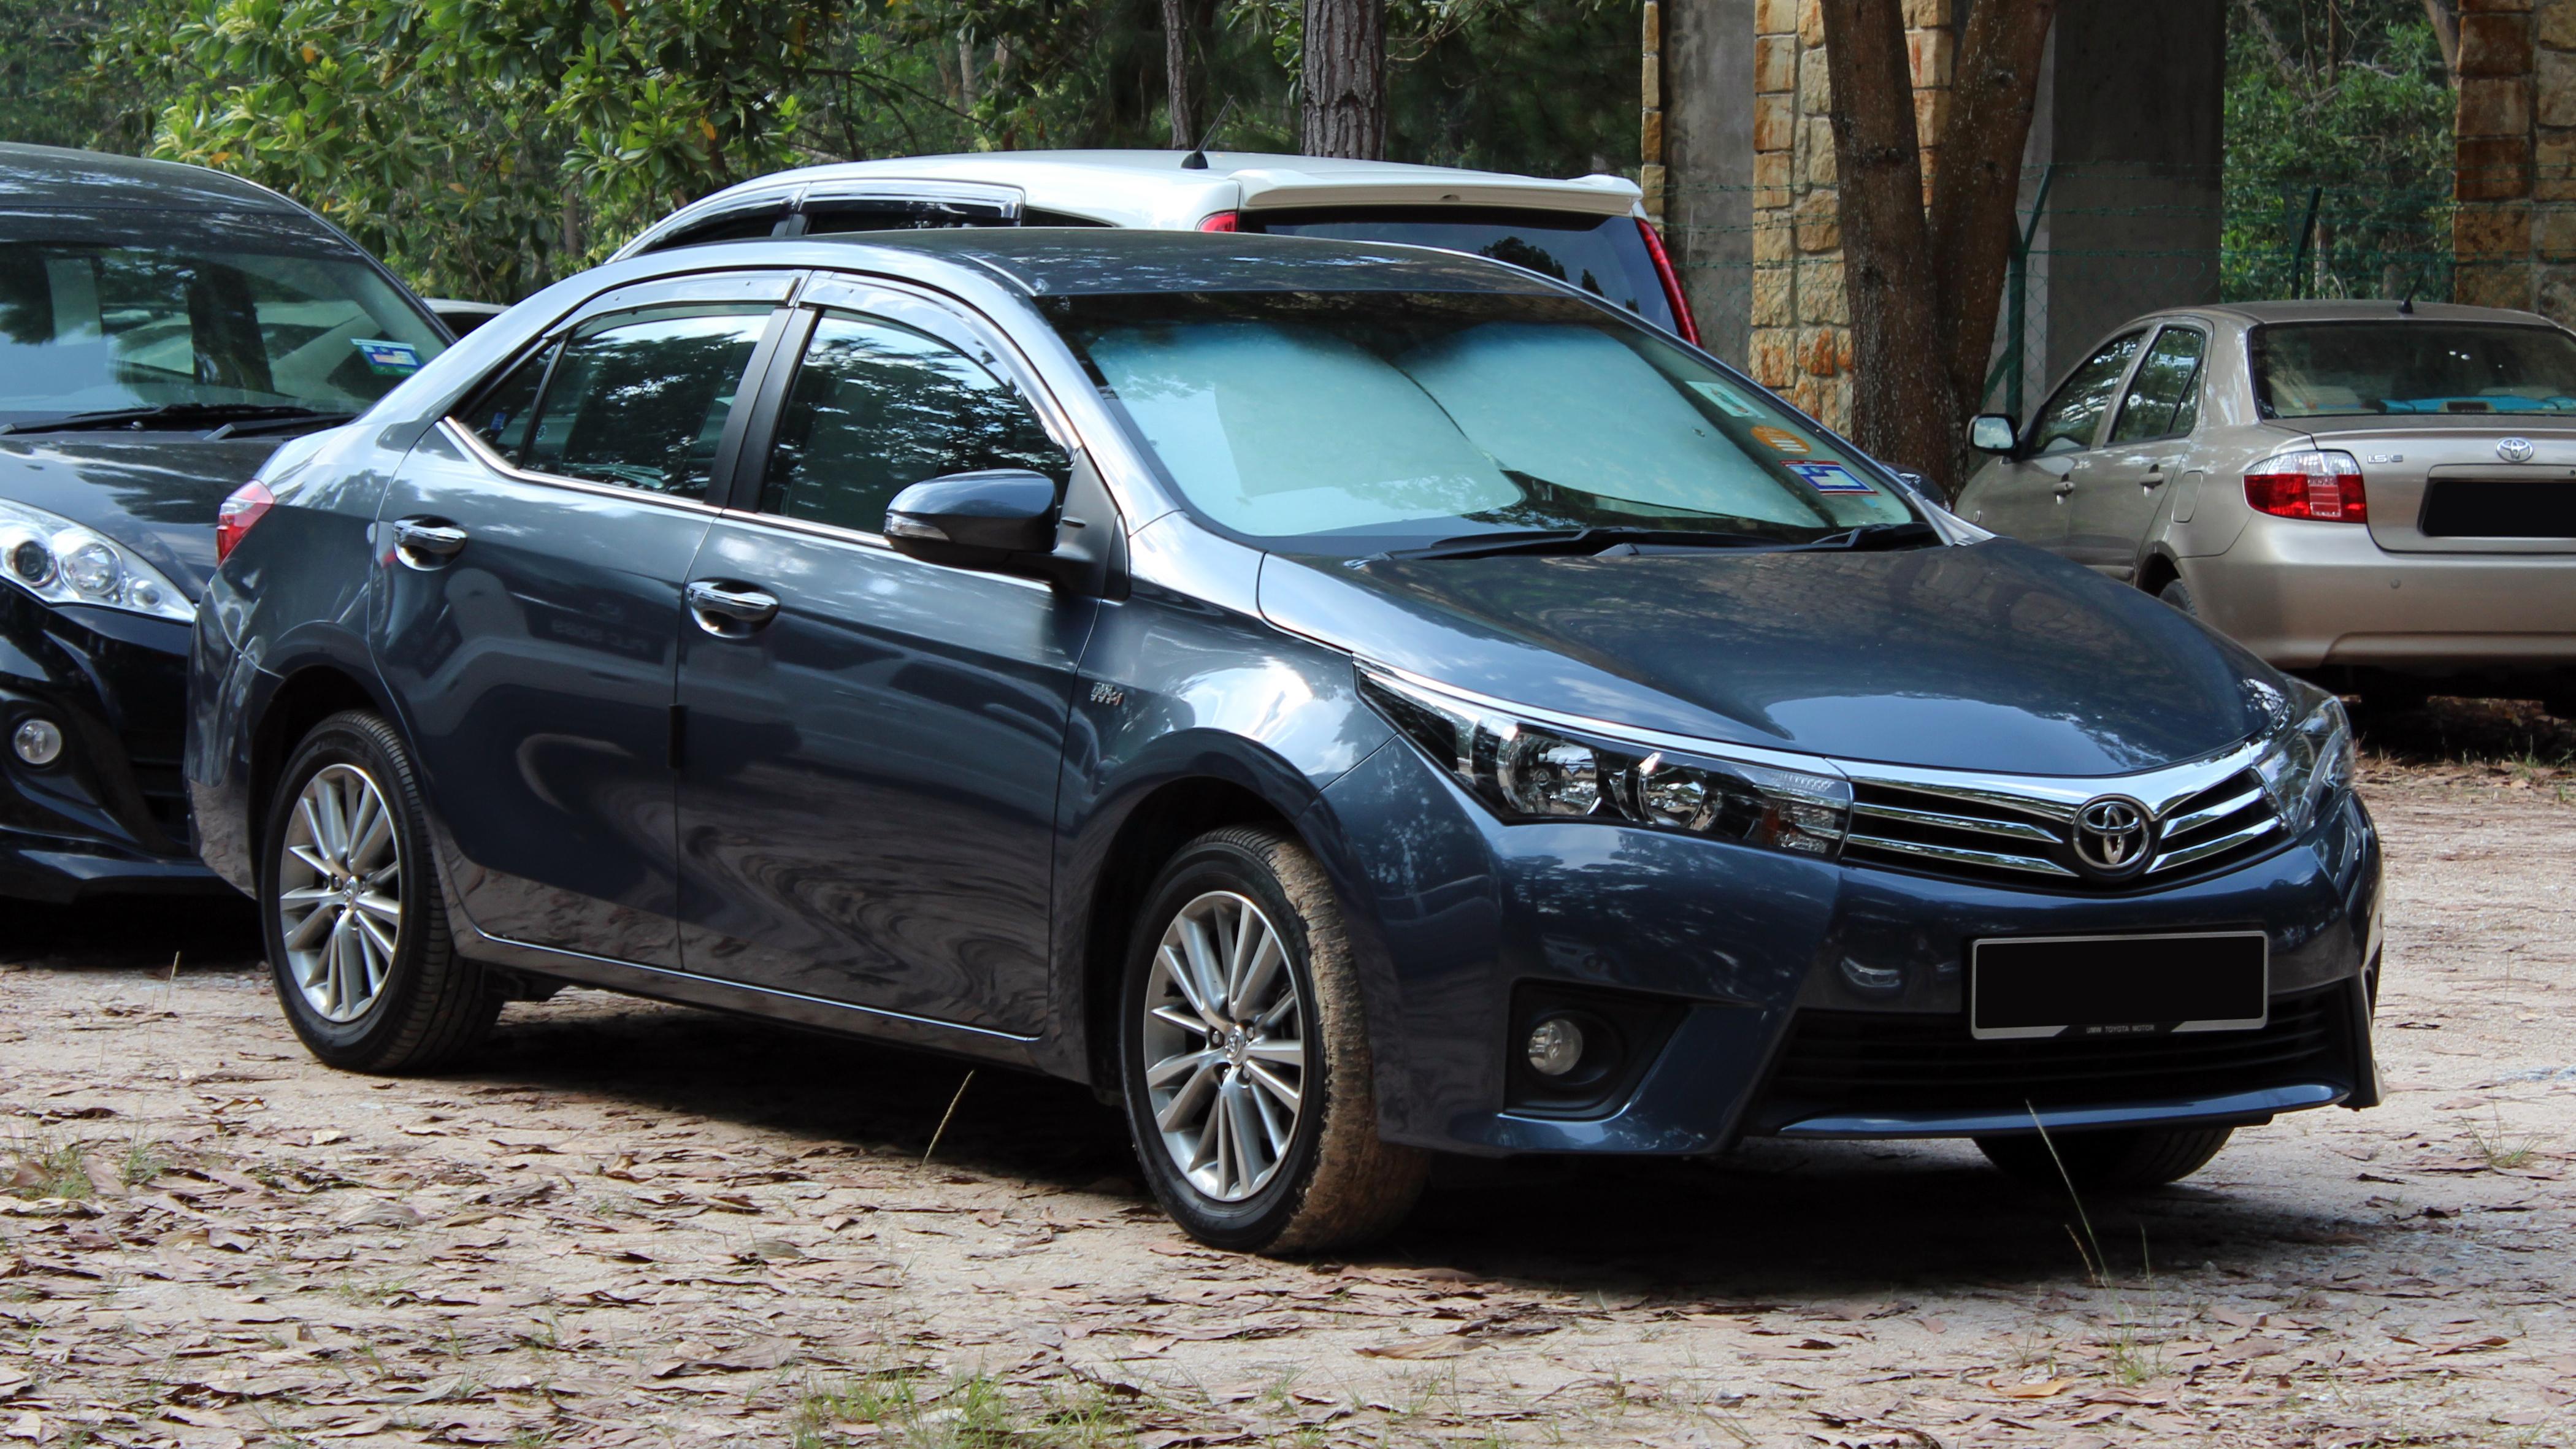 Kelebihan Toyota Altis 2014 Perbandingan Harga